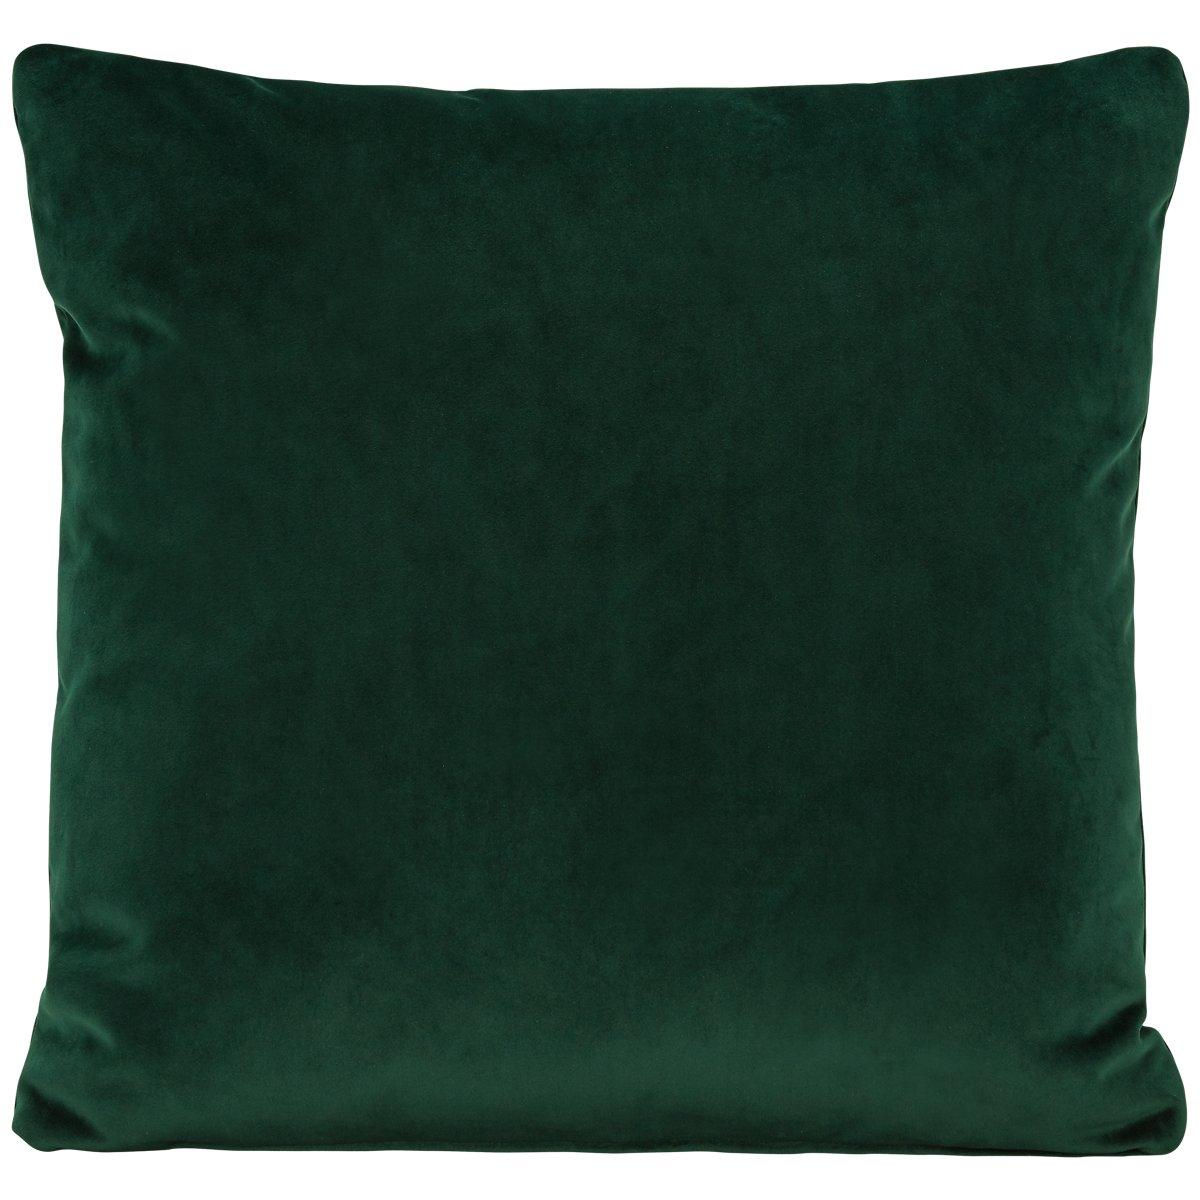 Throw Pillows For Dark Green Couch : Dark Green Sofa Pillows Okaycreations.net